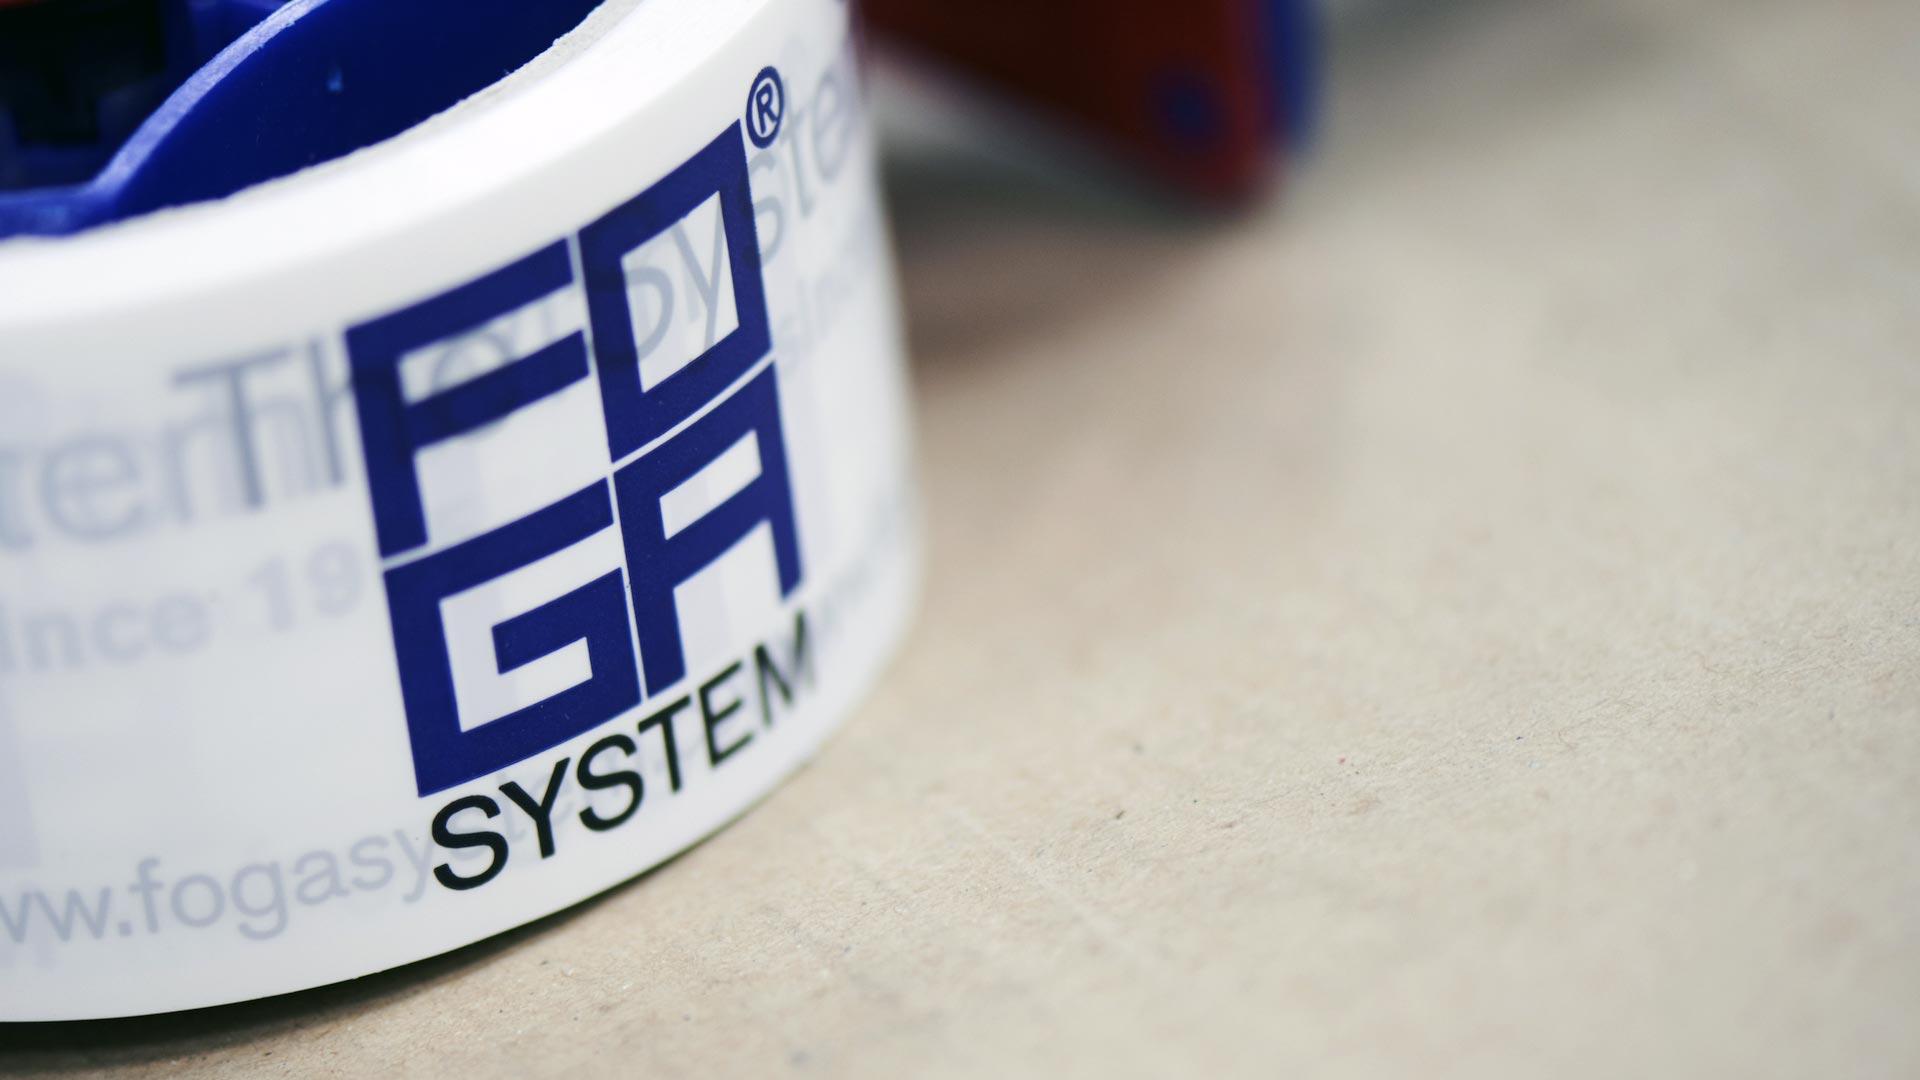 Foga System